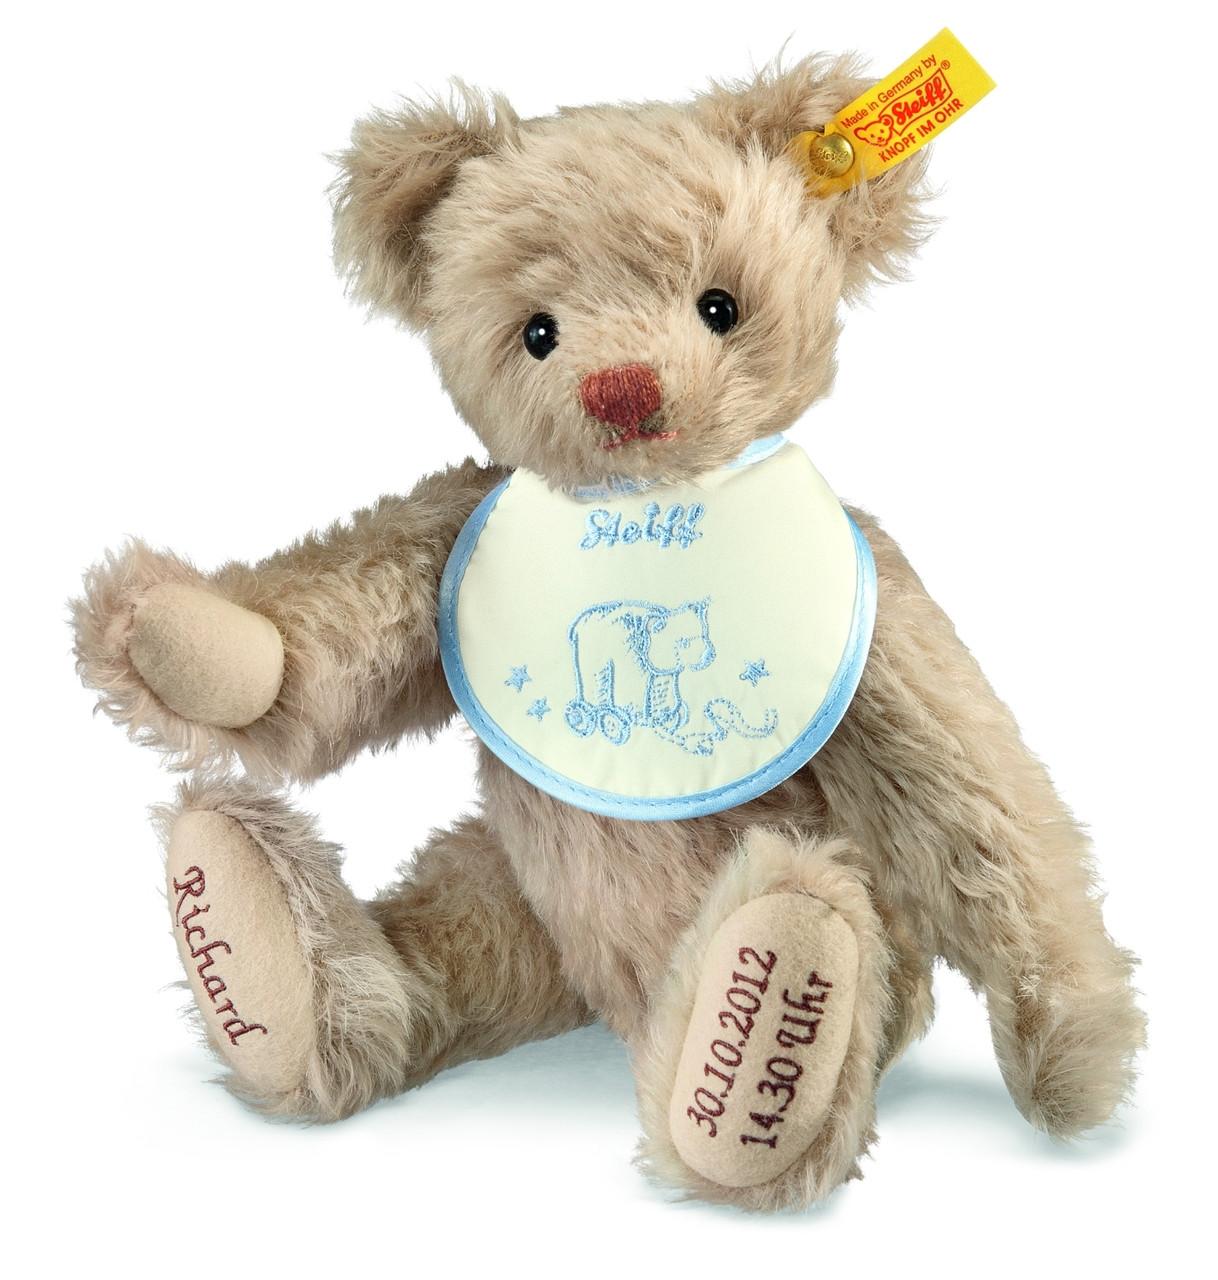 Personalised Baby Bib 1st Birthday Teddy Any name embroidered Birthday Gift